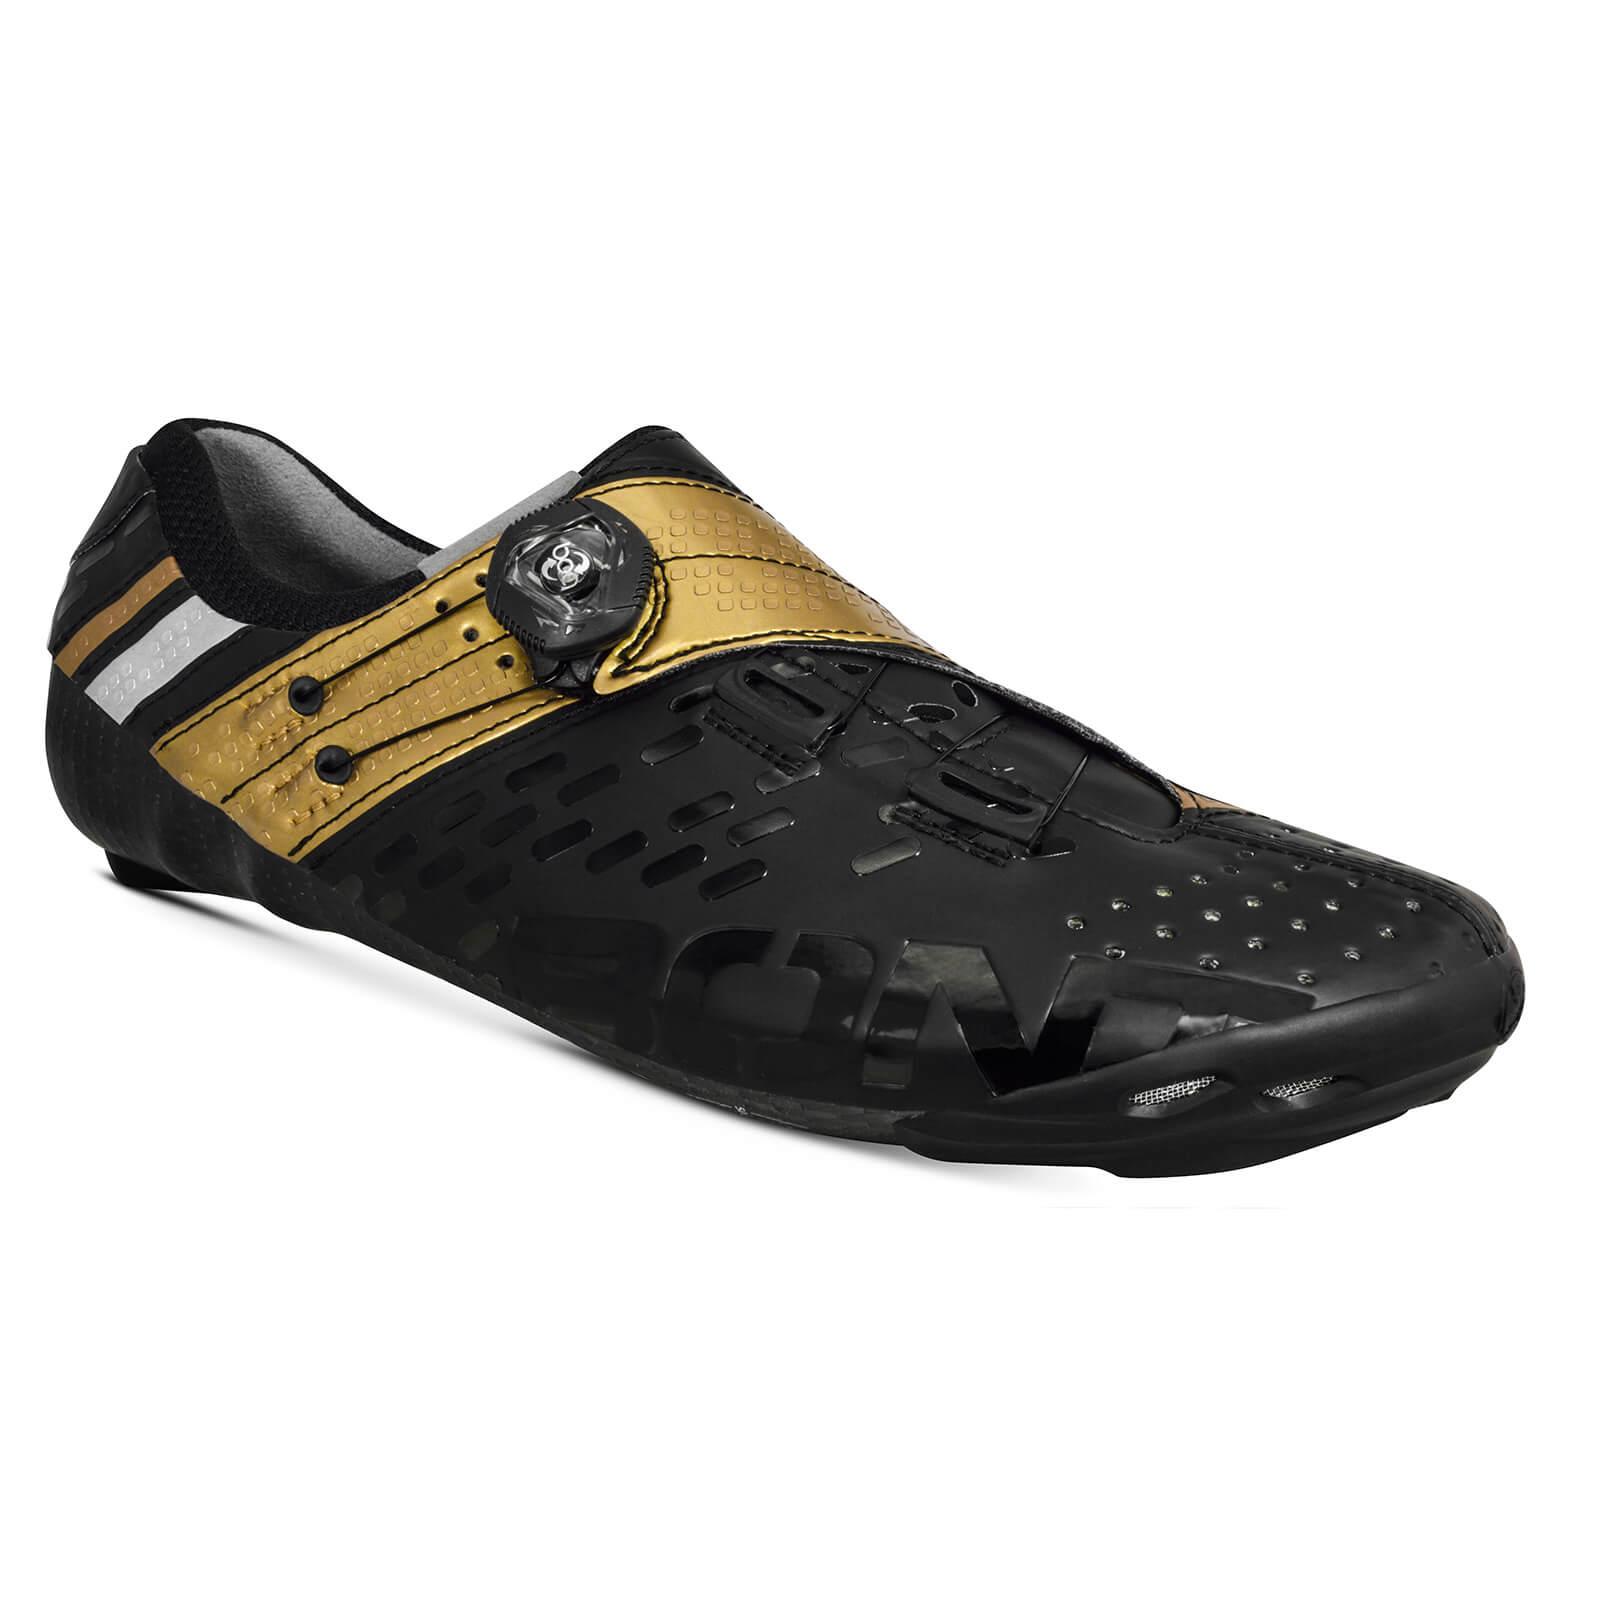 Bont Helix Rennradschuhe - EU 47 - Black/Gold